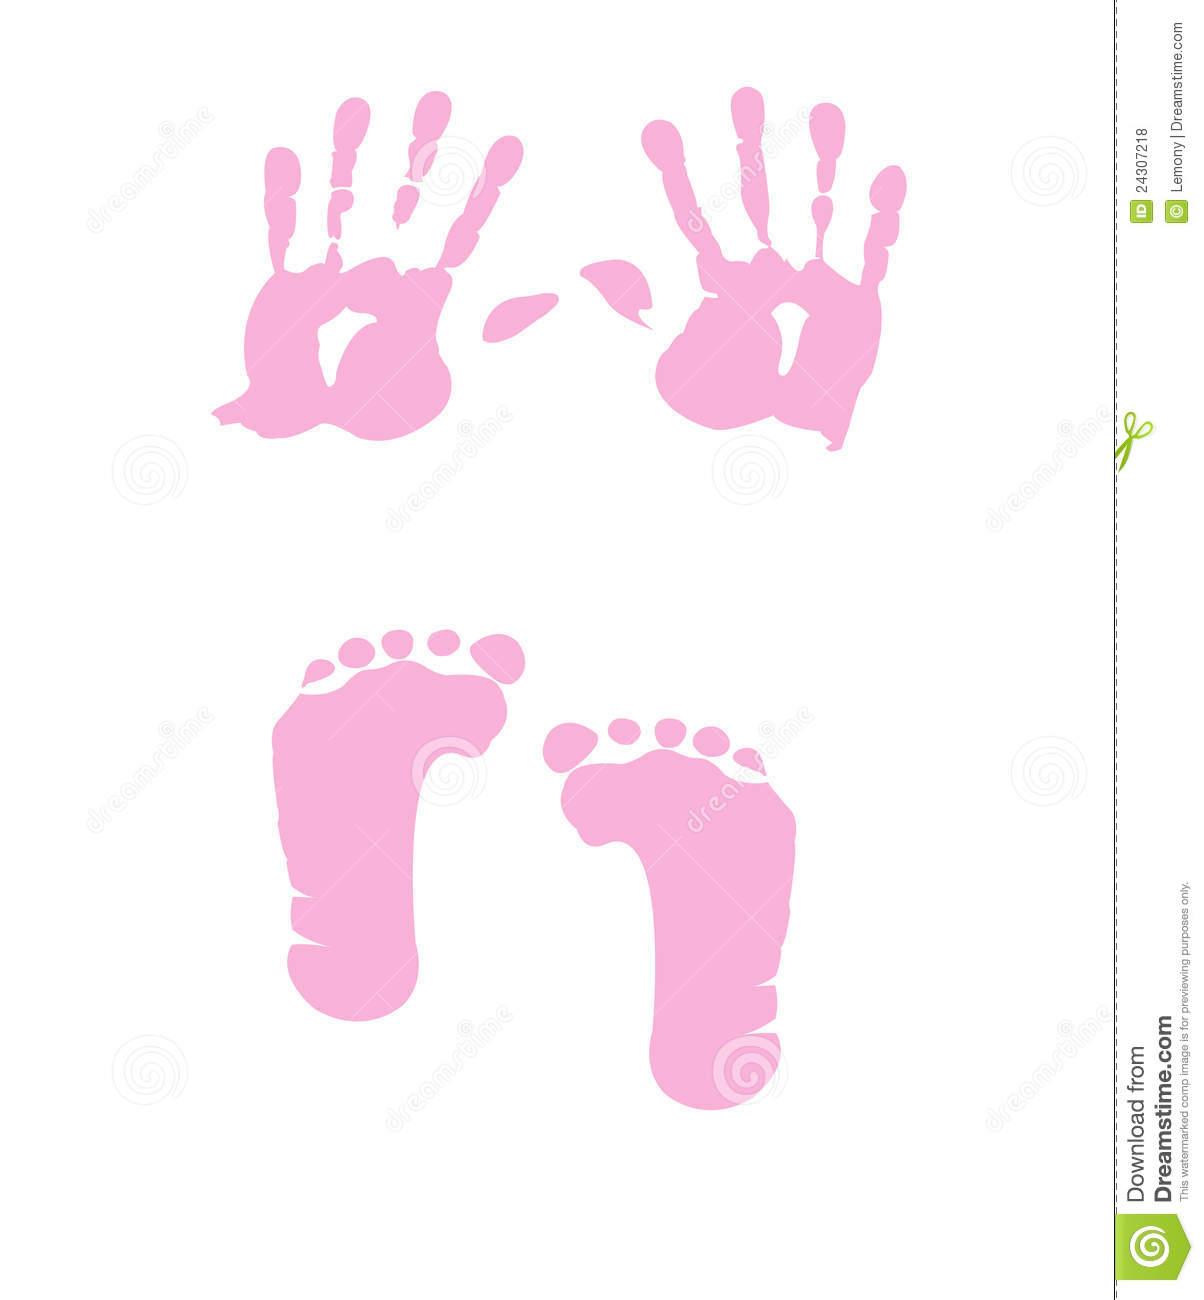 Handprint clipart pink &  handprint Showing Baby